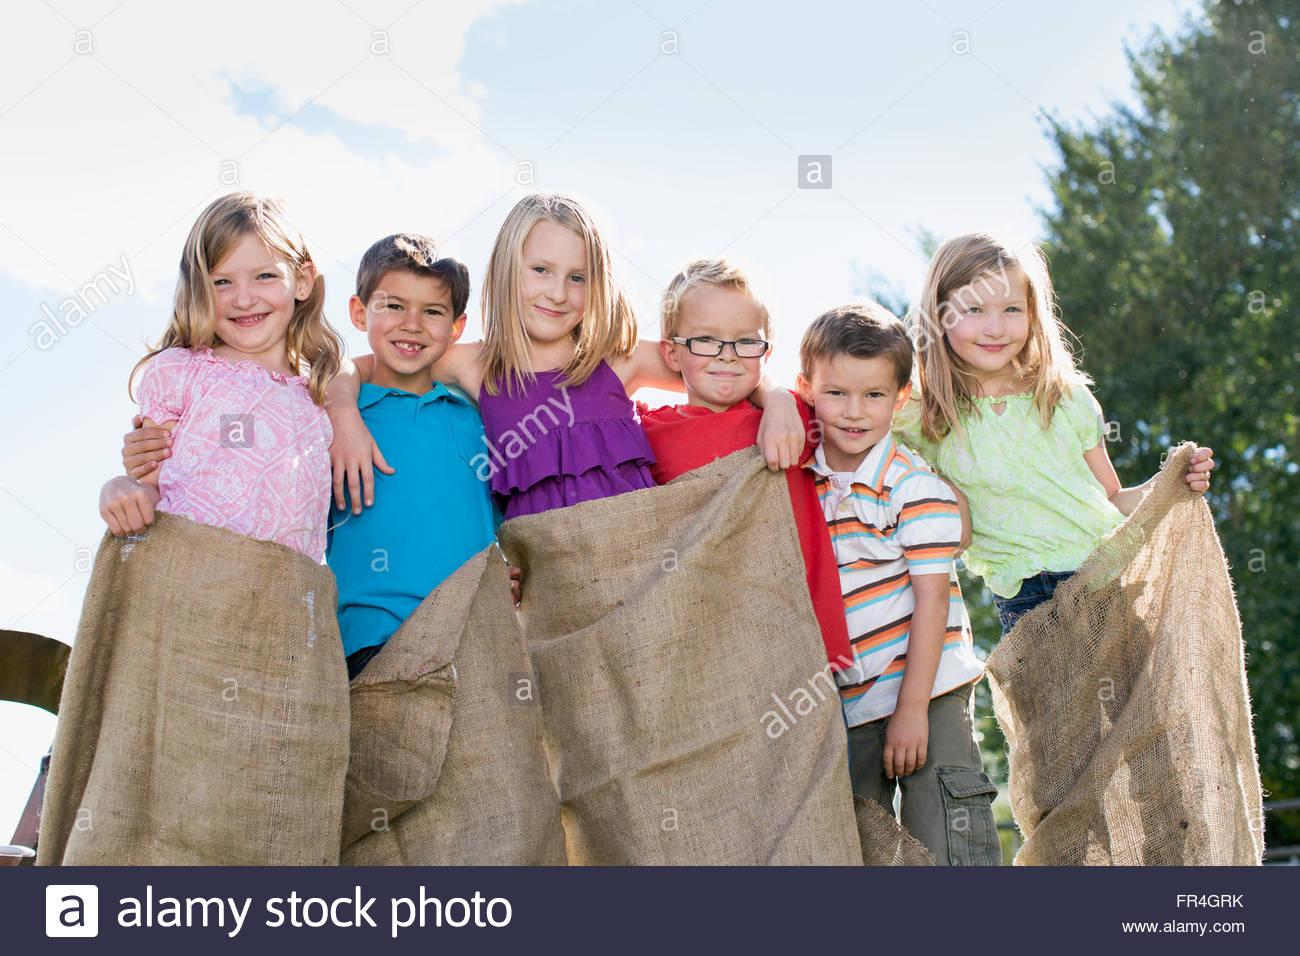 Cousins standing together with potato sacks on. - Stock Image